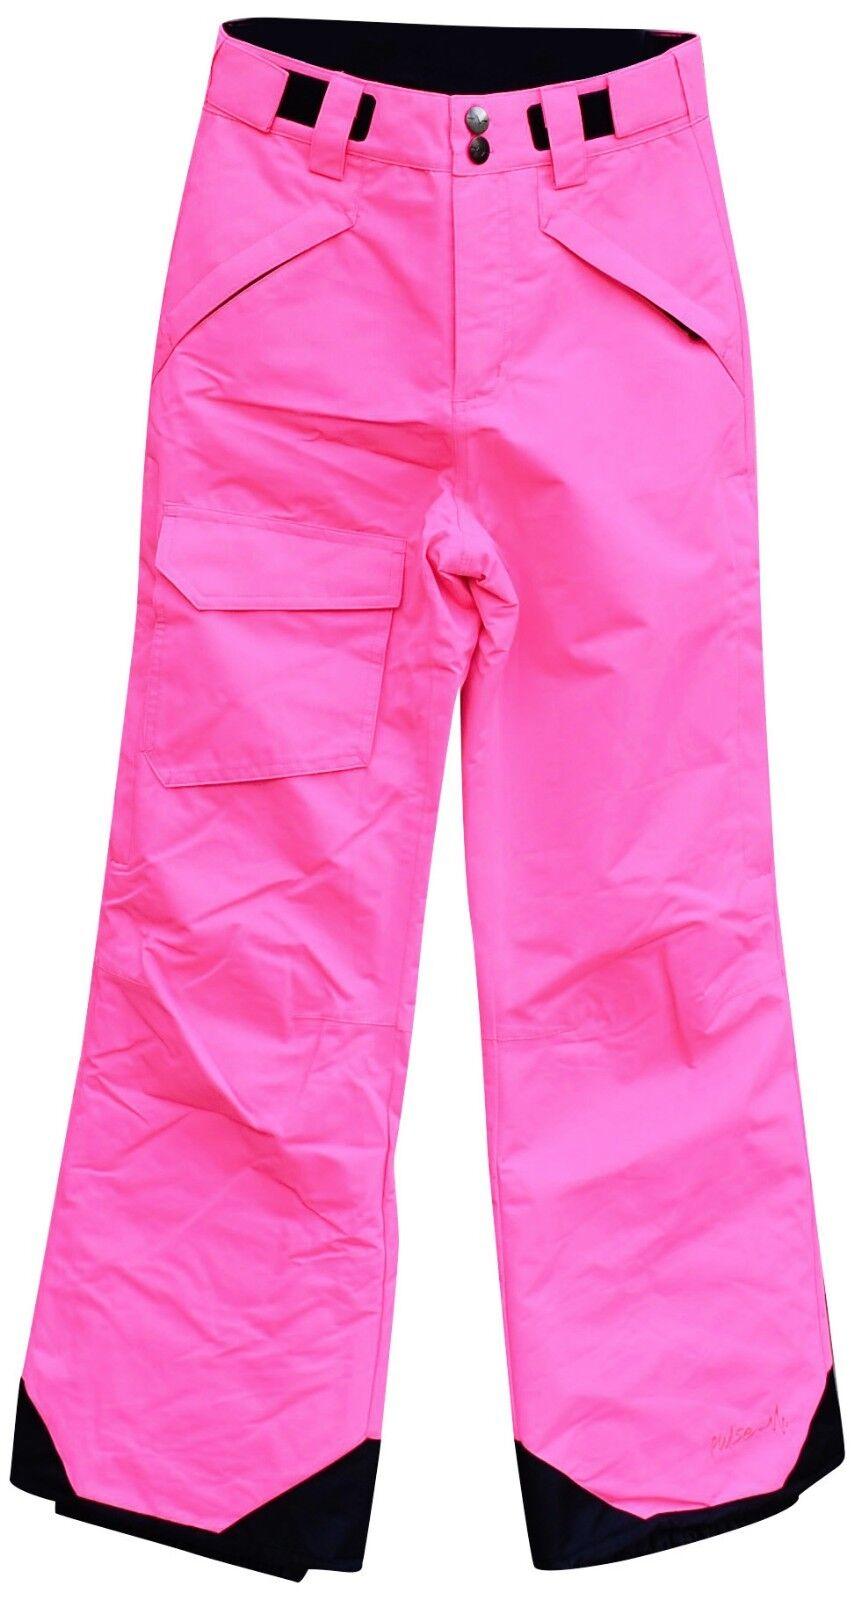 New Pulse Girls Youth Snow Ski Snowboarding Pants S M L 7 8 10 12 14 16 Pink